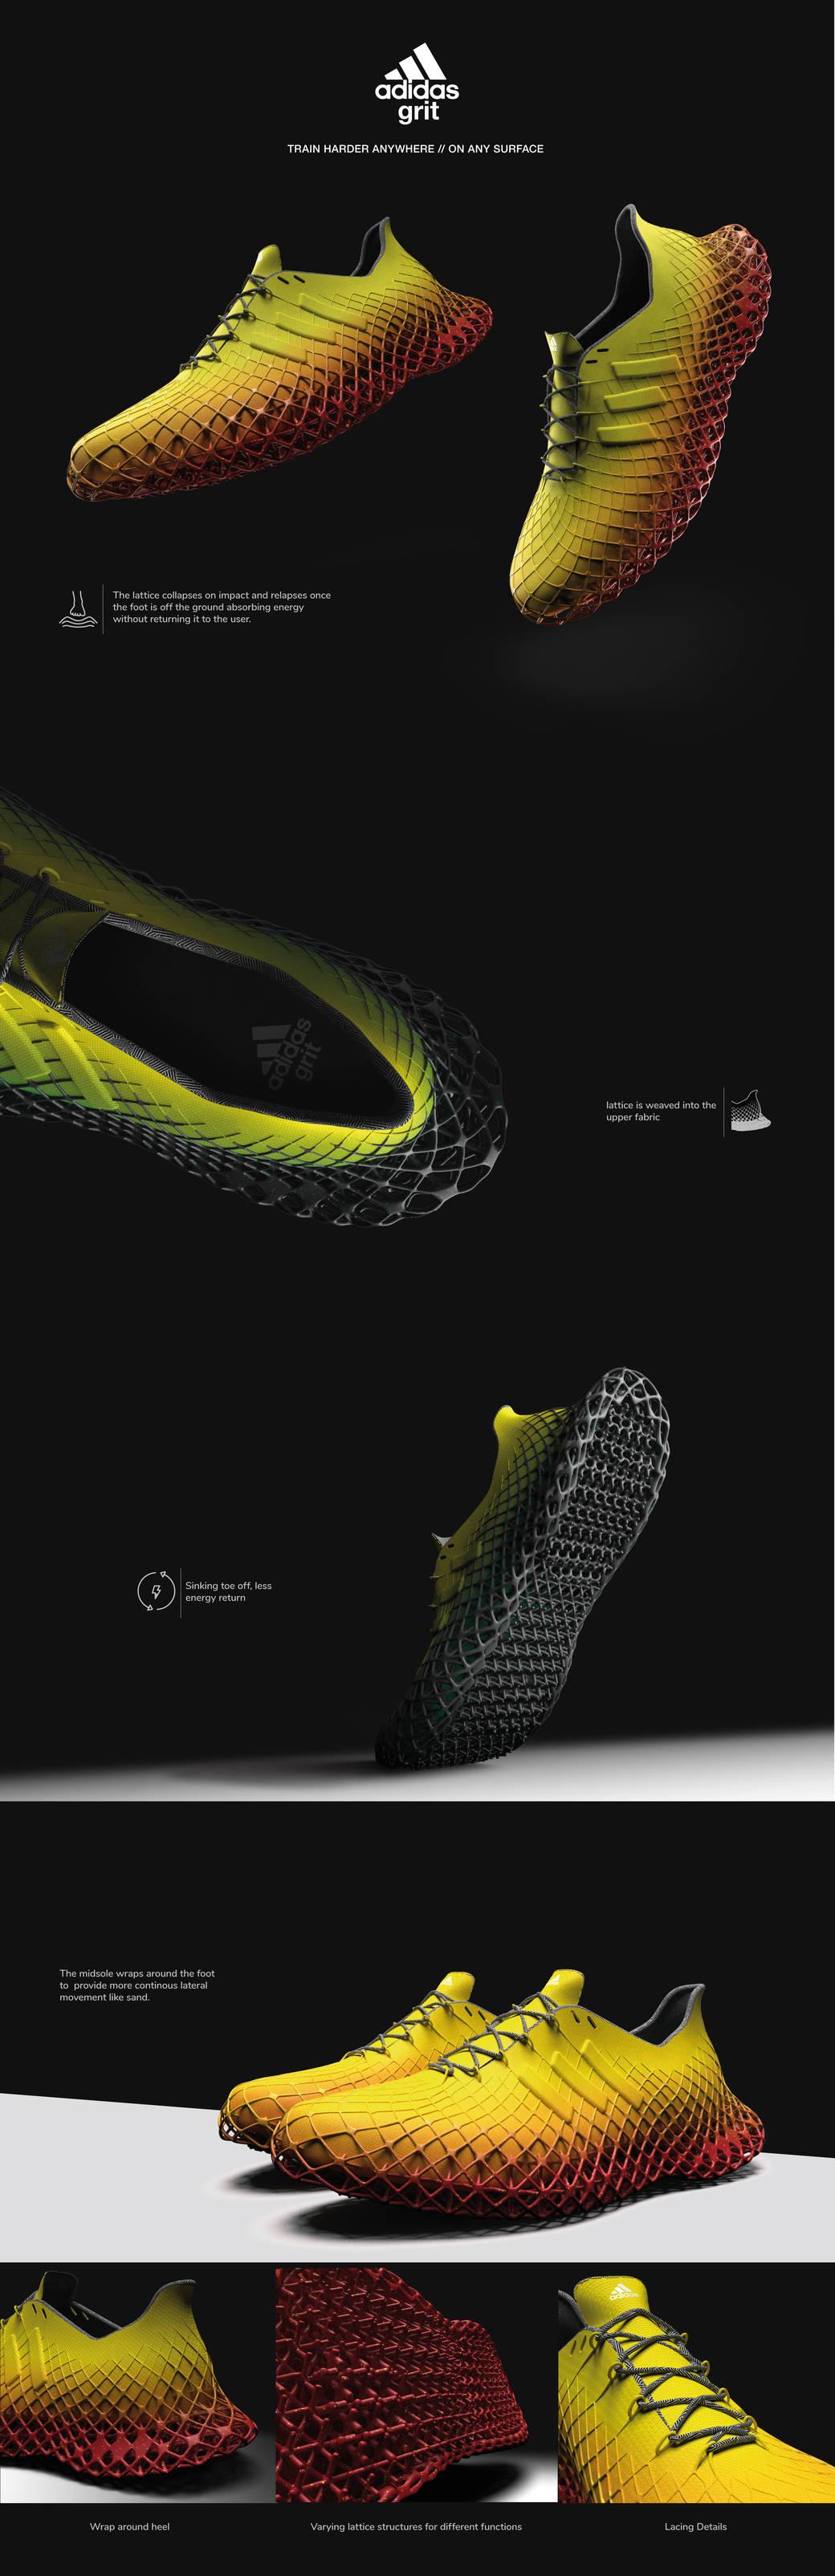 shoe design by Aarish Netarwala